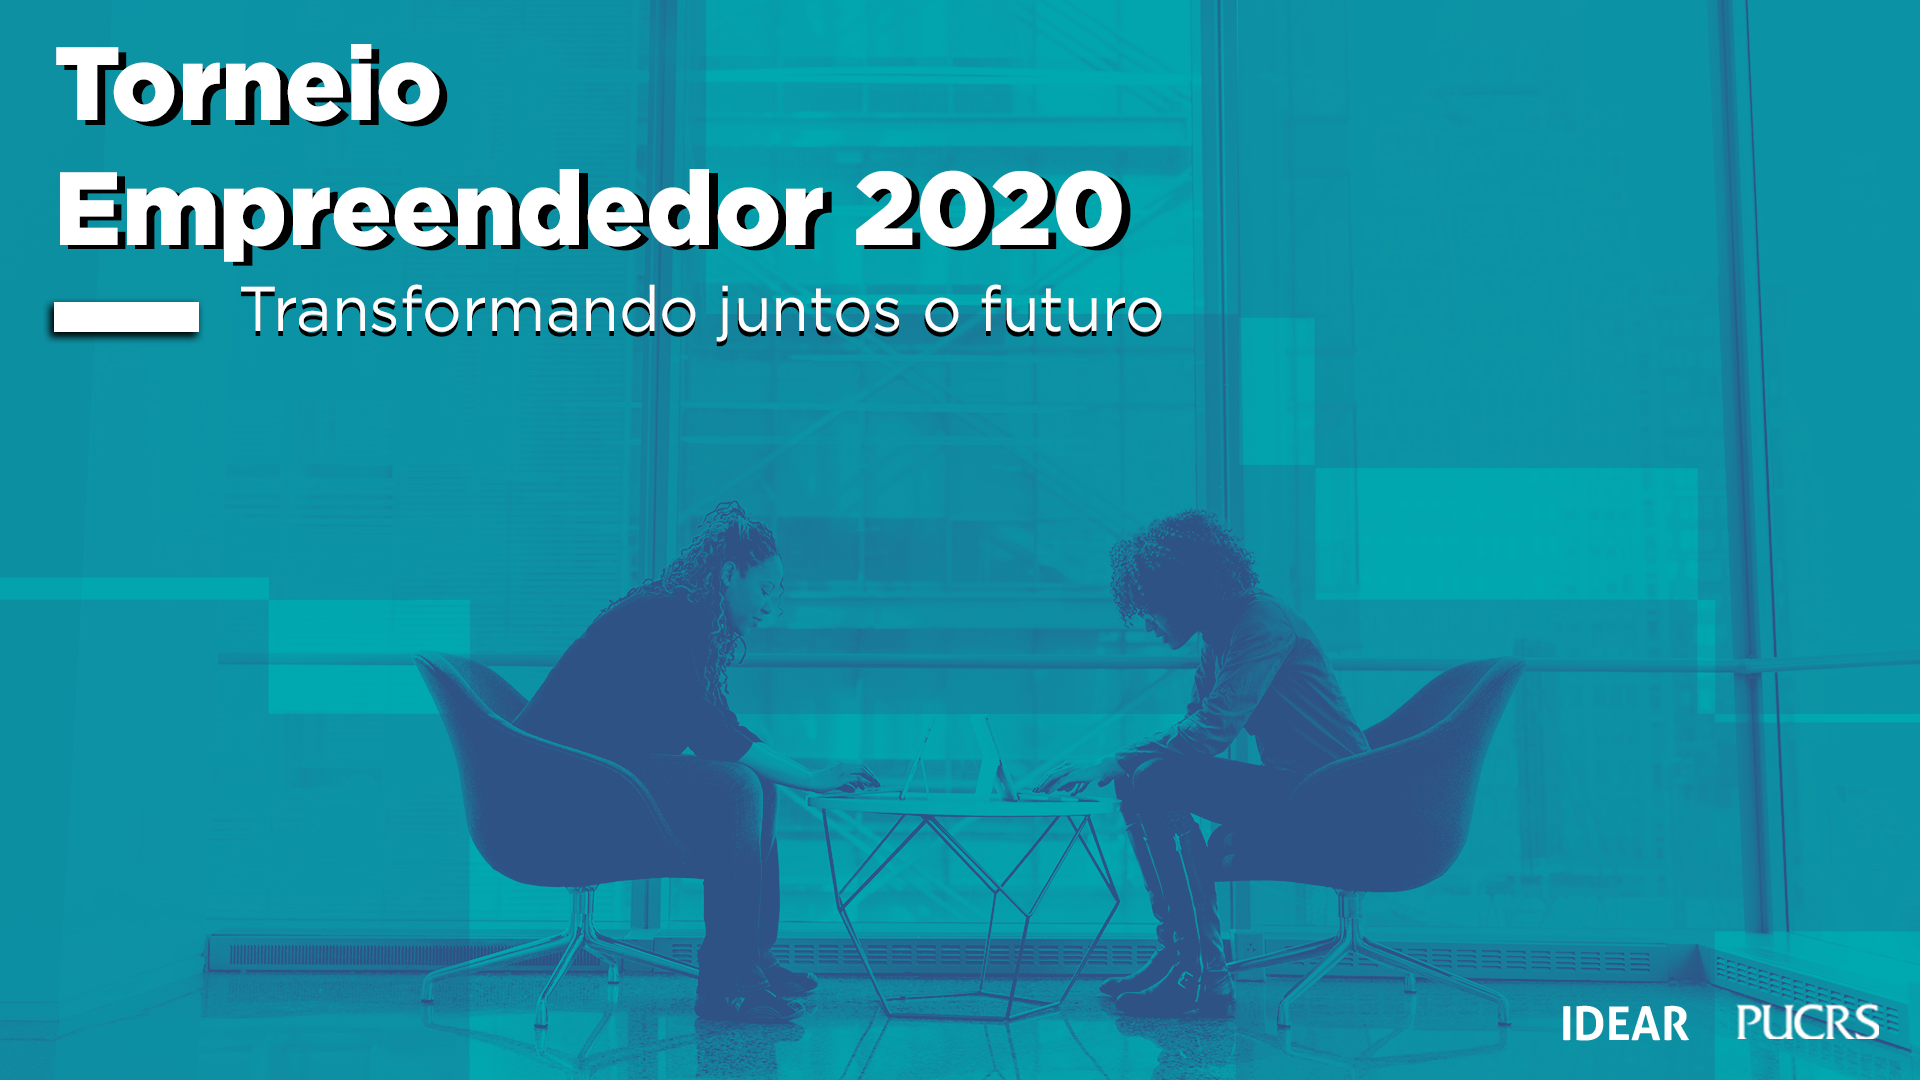 Torneio Empreendedor de 2020